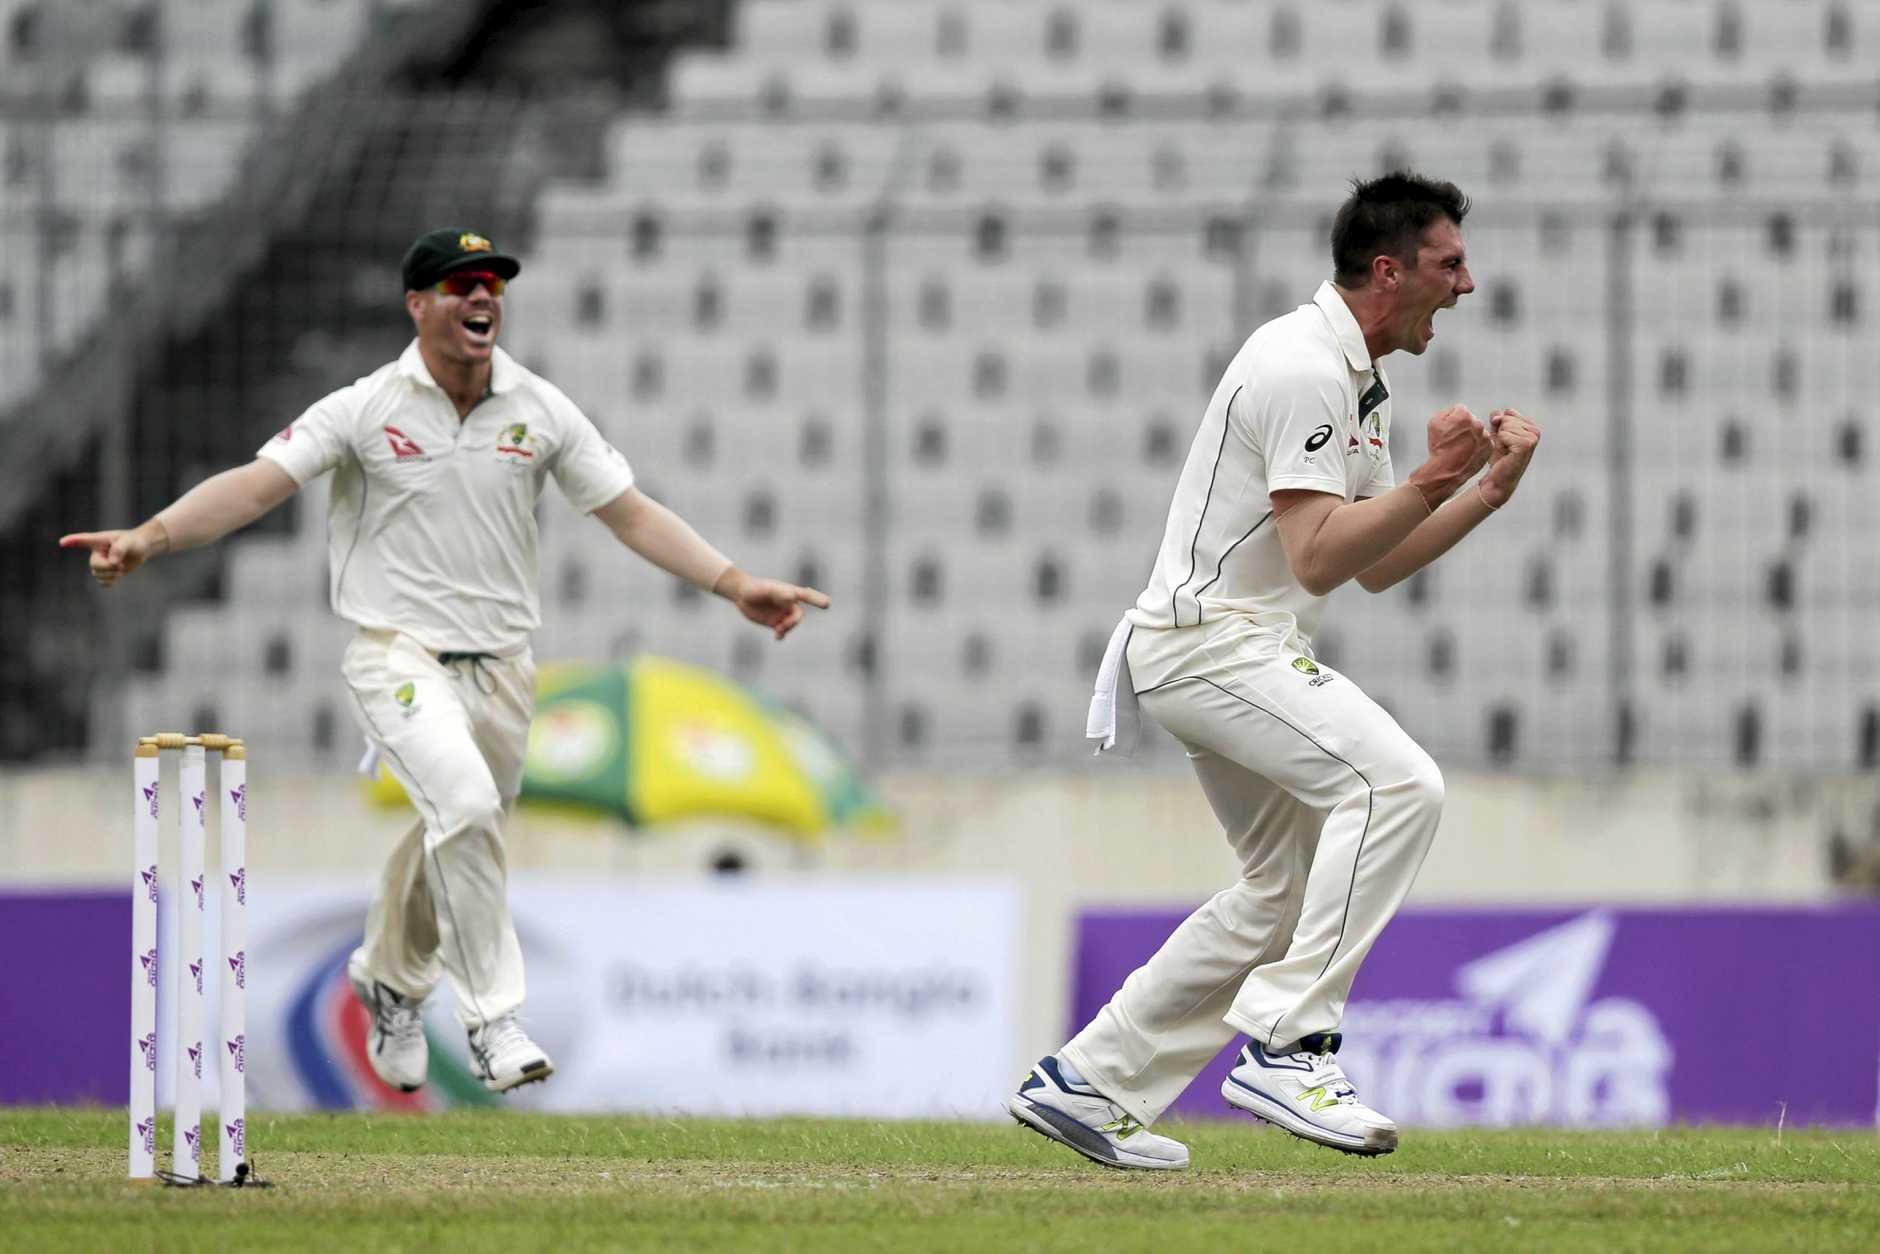 Australia's Pat Cummins, right, and David Warner, left, celebrate the dismissal of Bangladesh's cricketer Sabbir Rahman